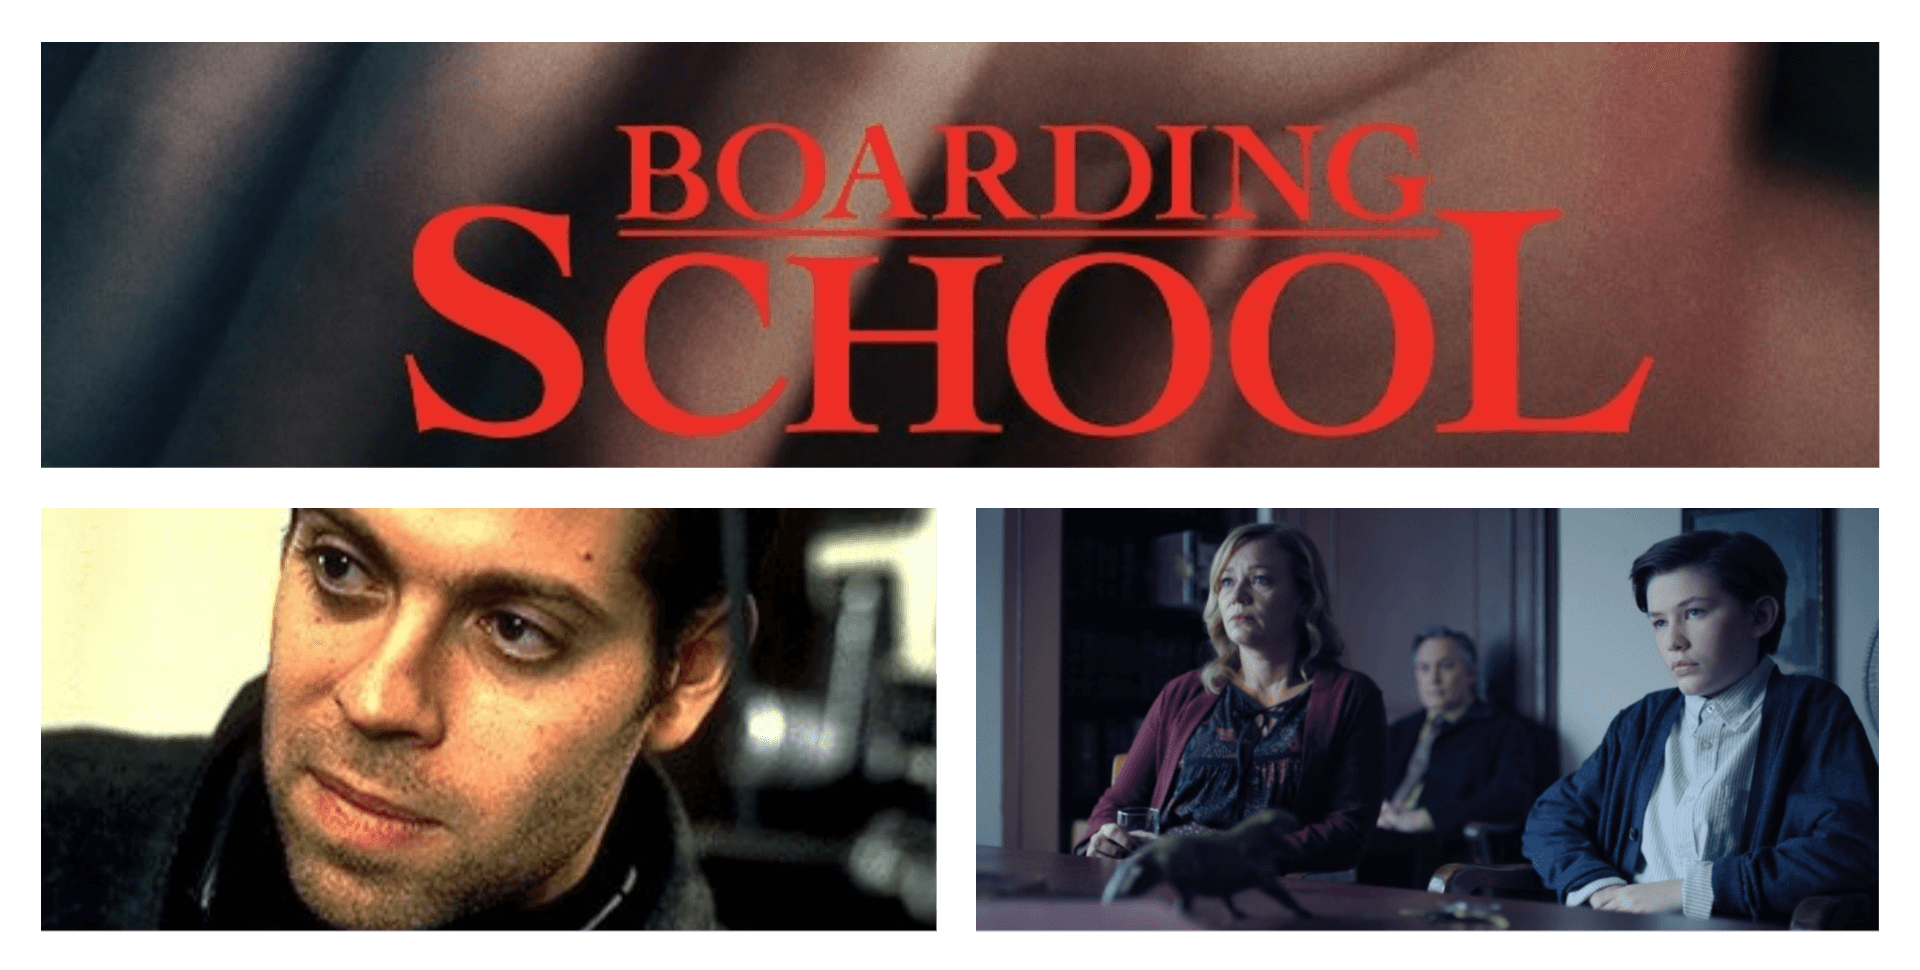 Boarding School – Interview with Director Boaz Yakin